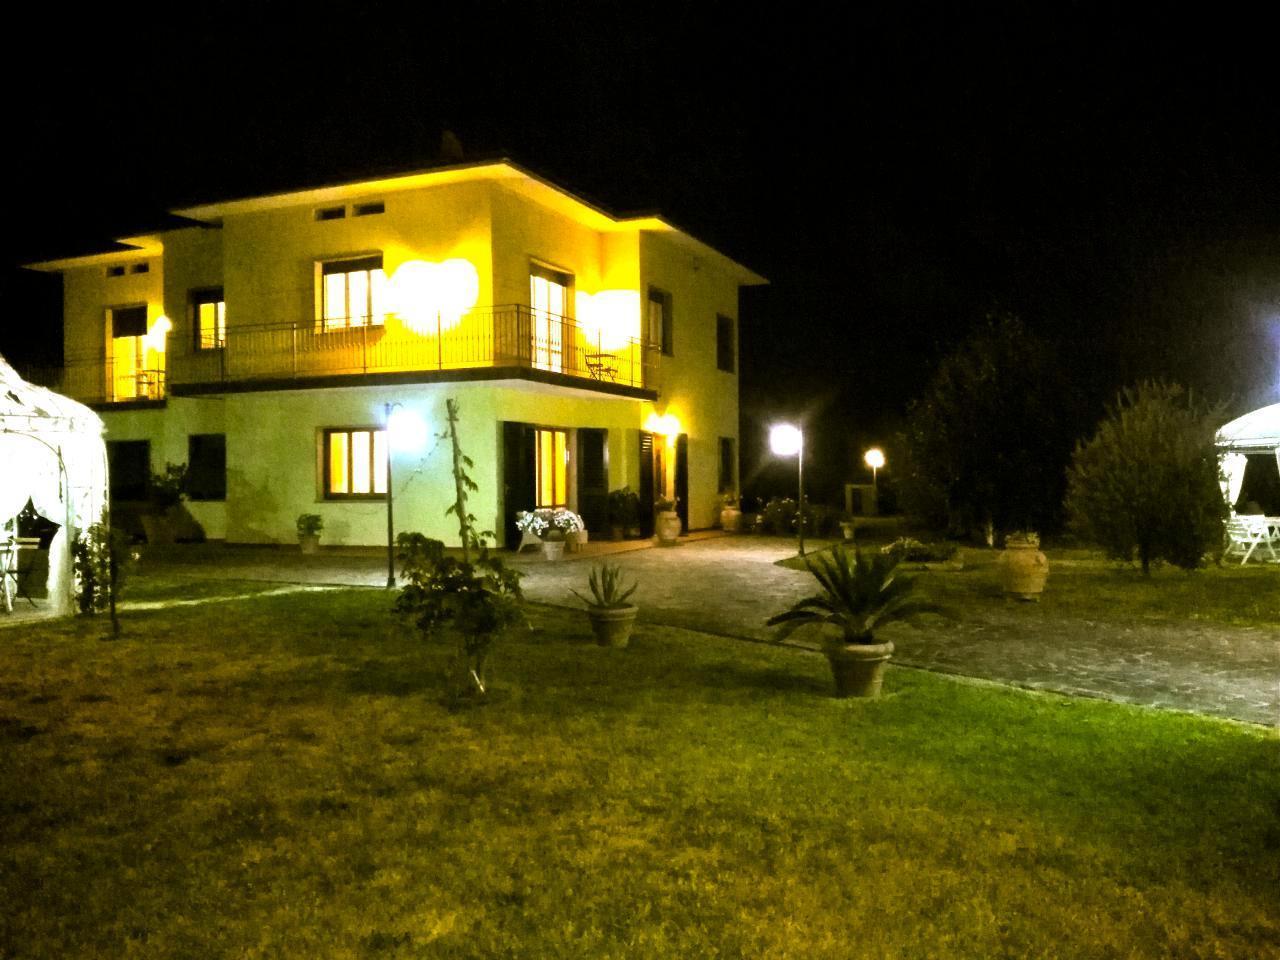 Ferienwohnung La Valinfiore charming apartment in Montecarlo (1921690), Montecarlo, Lucca-Versilia, Toskana, Italien, Bild 33